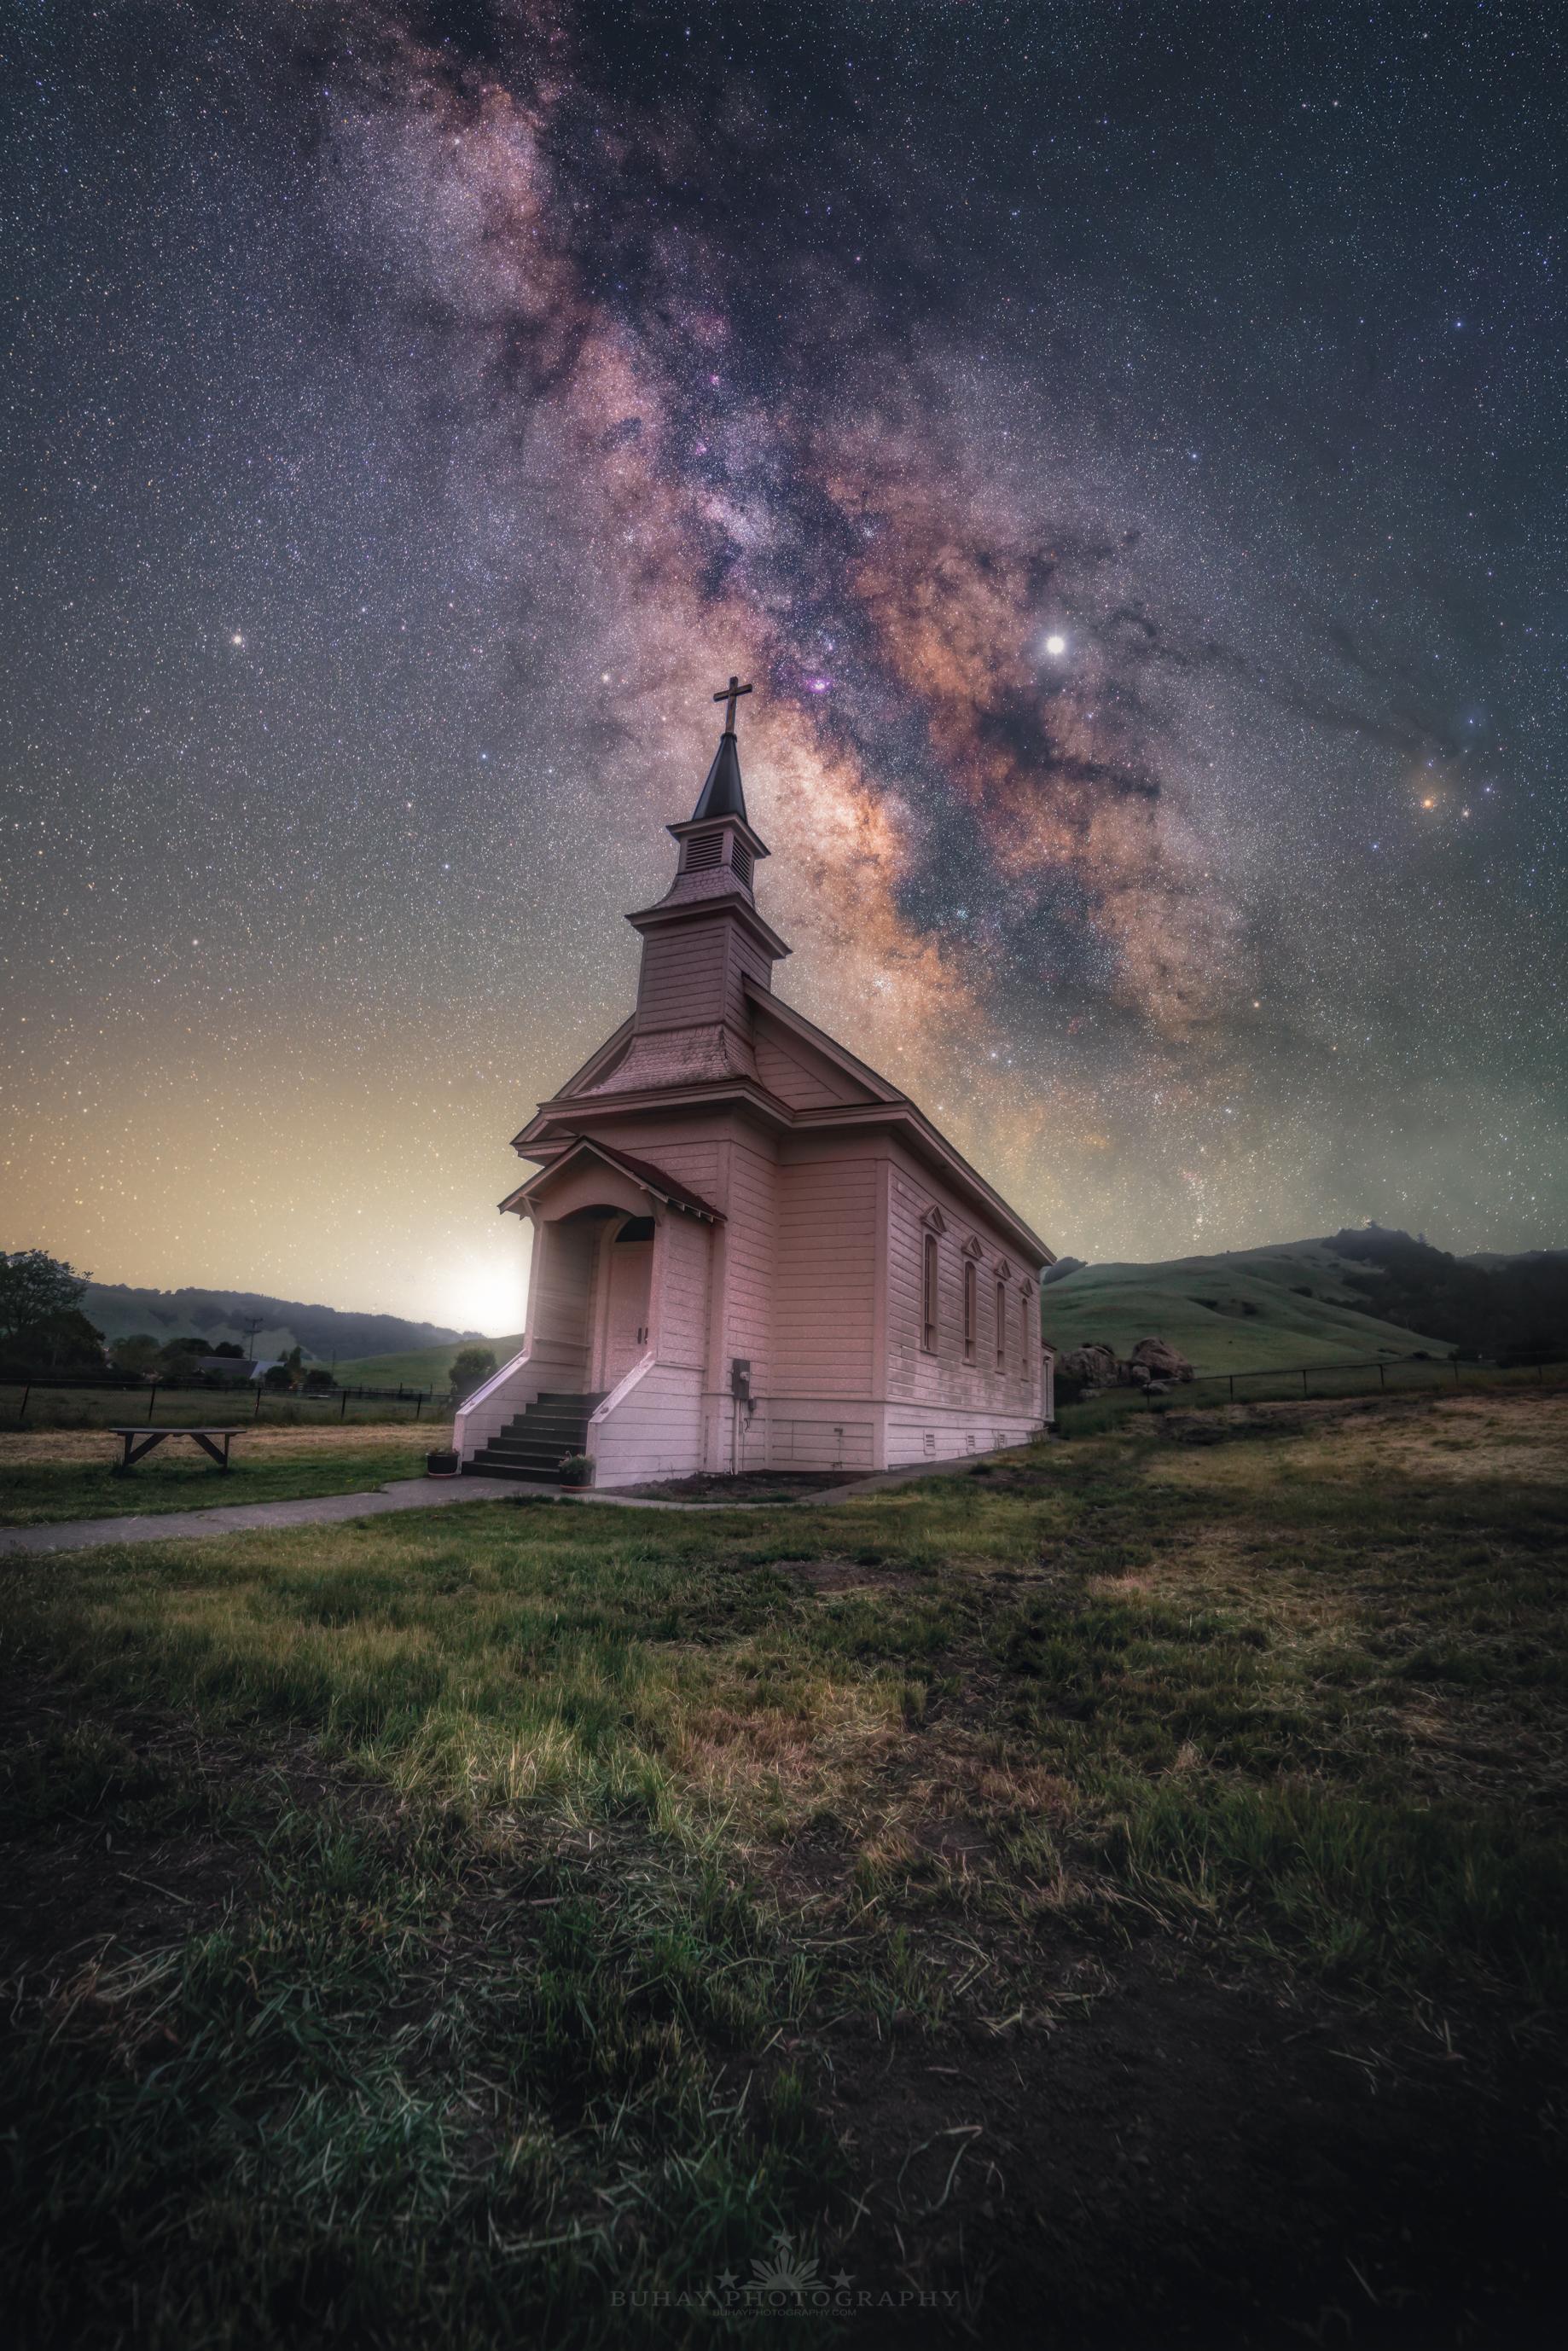 Buhay Photography 2019 Milky Way